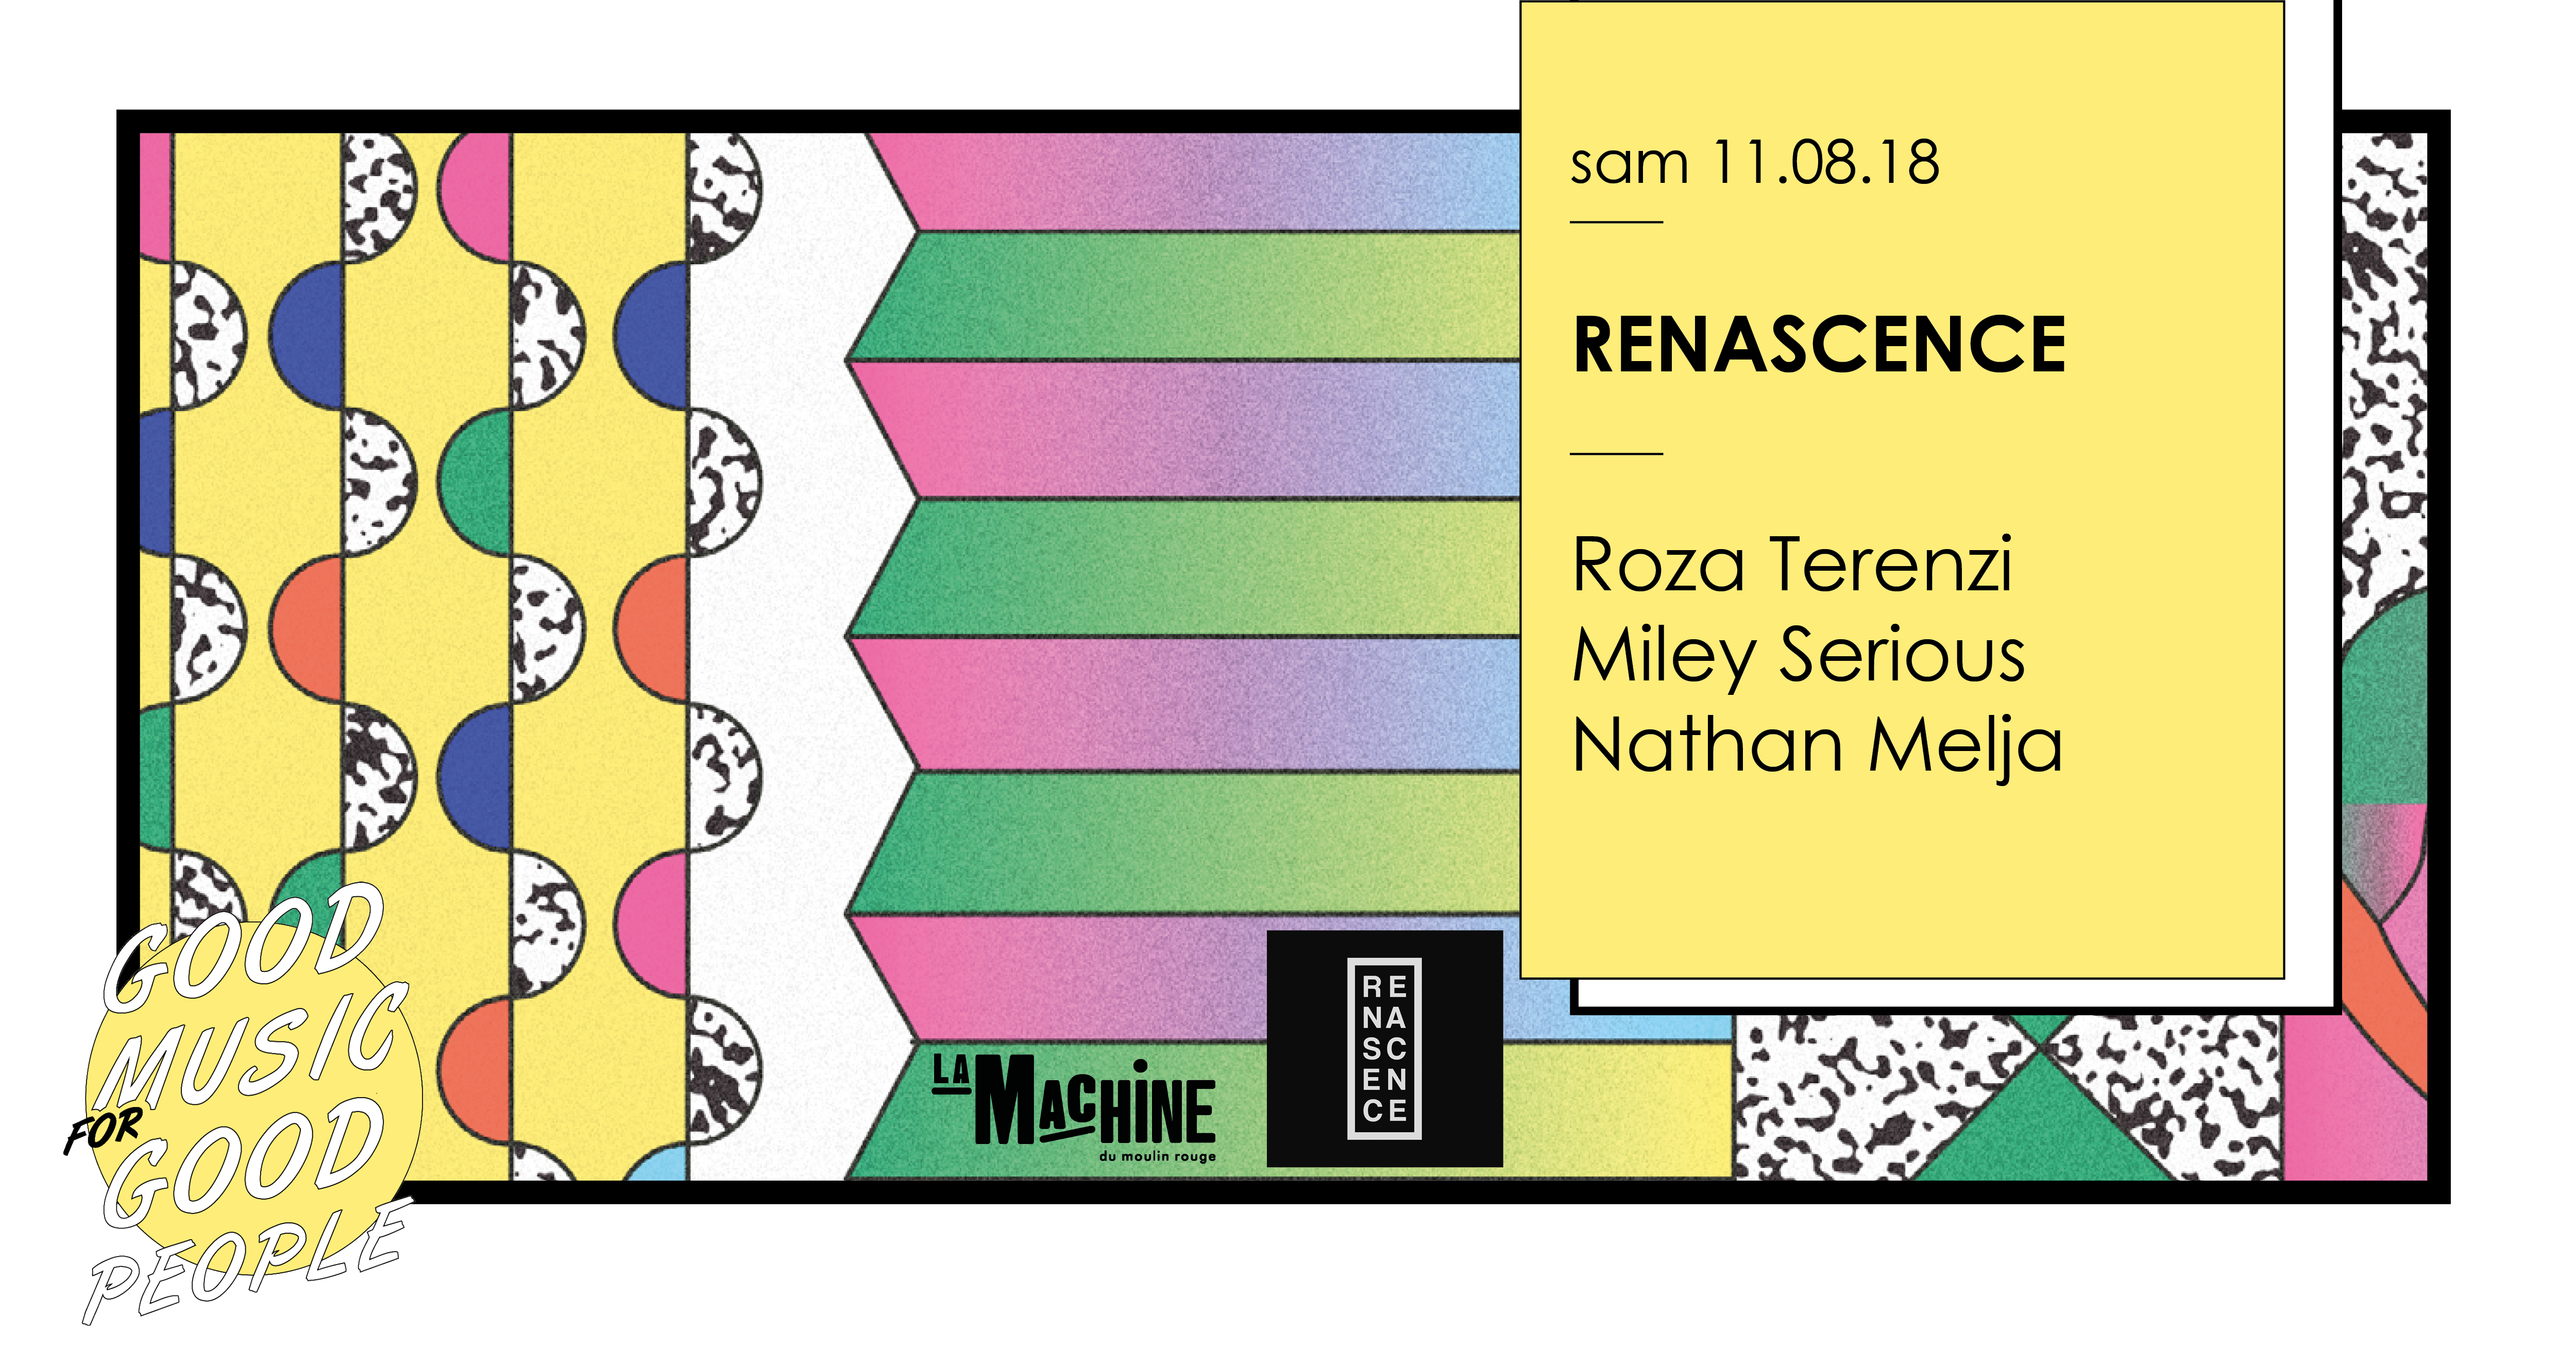 Renascence : Roza Terenzi • Miley Serious • Nathan Melja